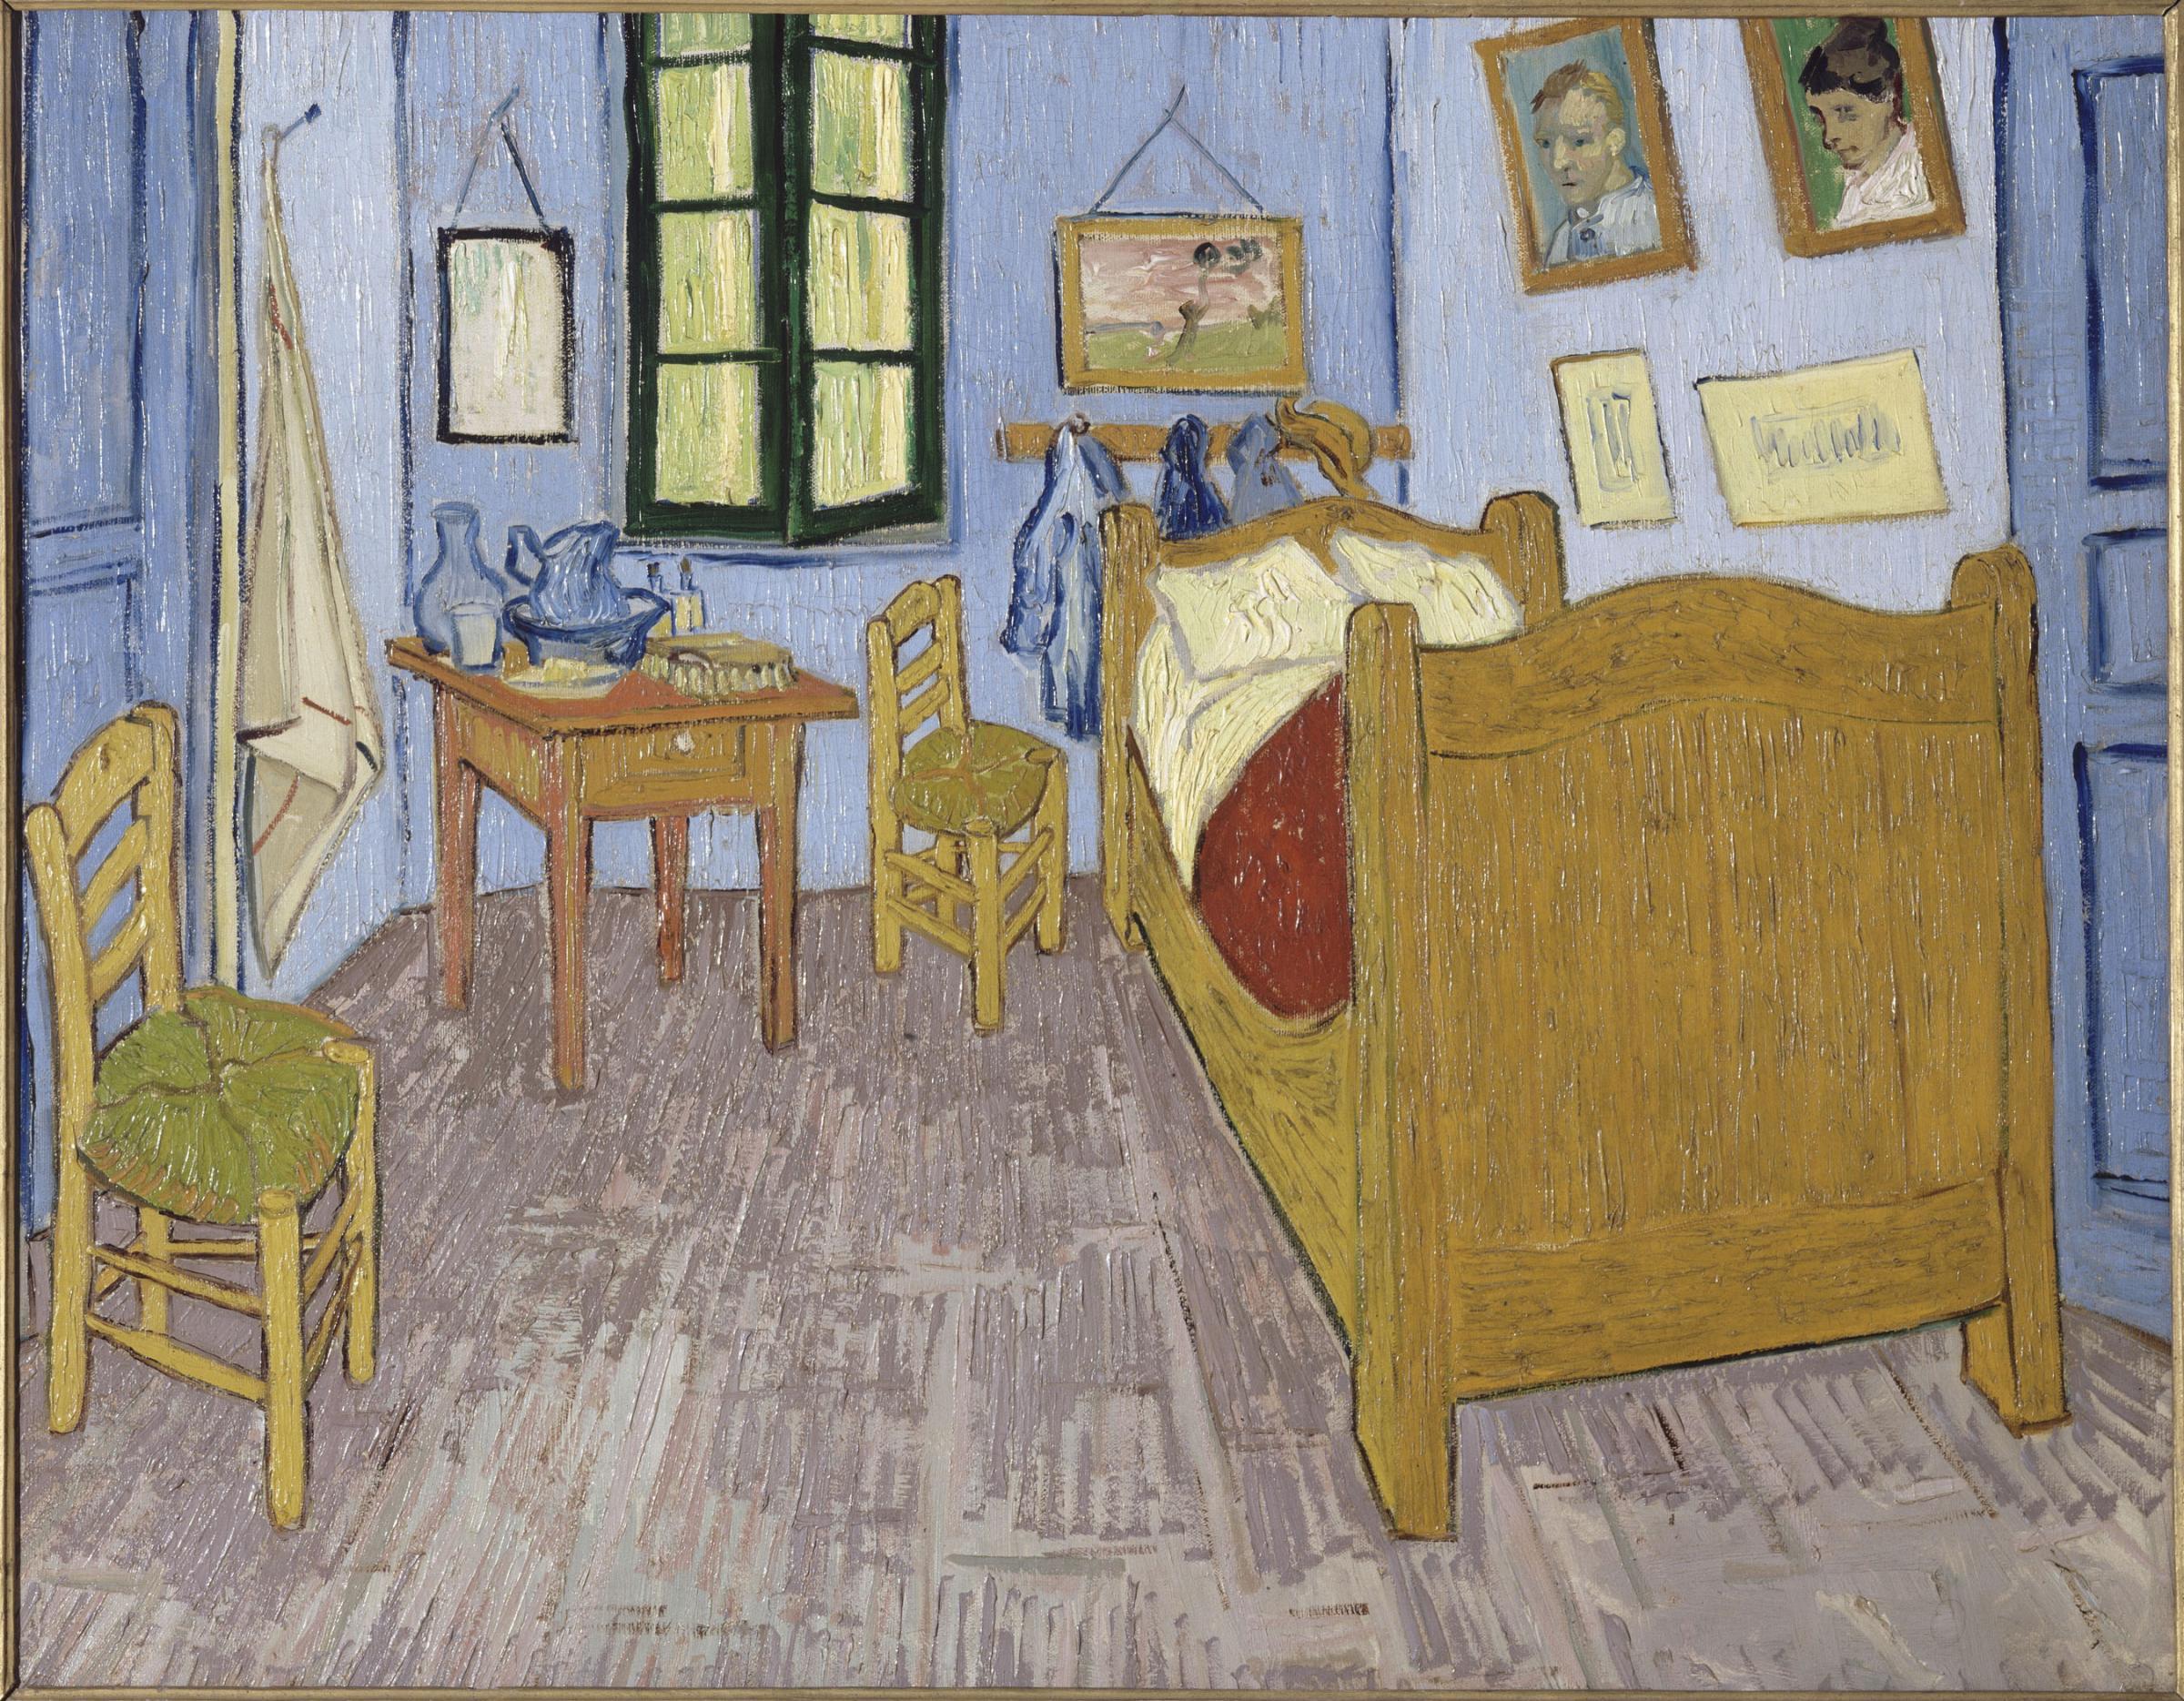 detroit art museum to display van gogh painting michigan radio